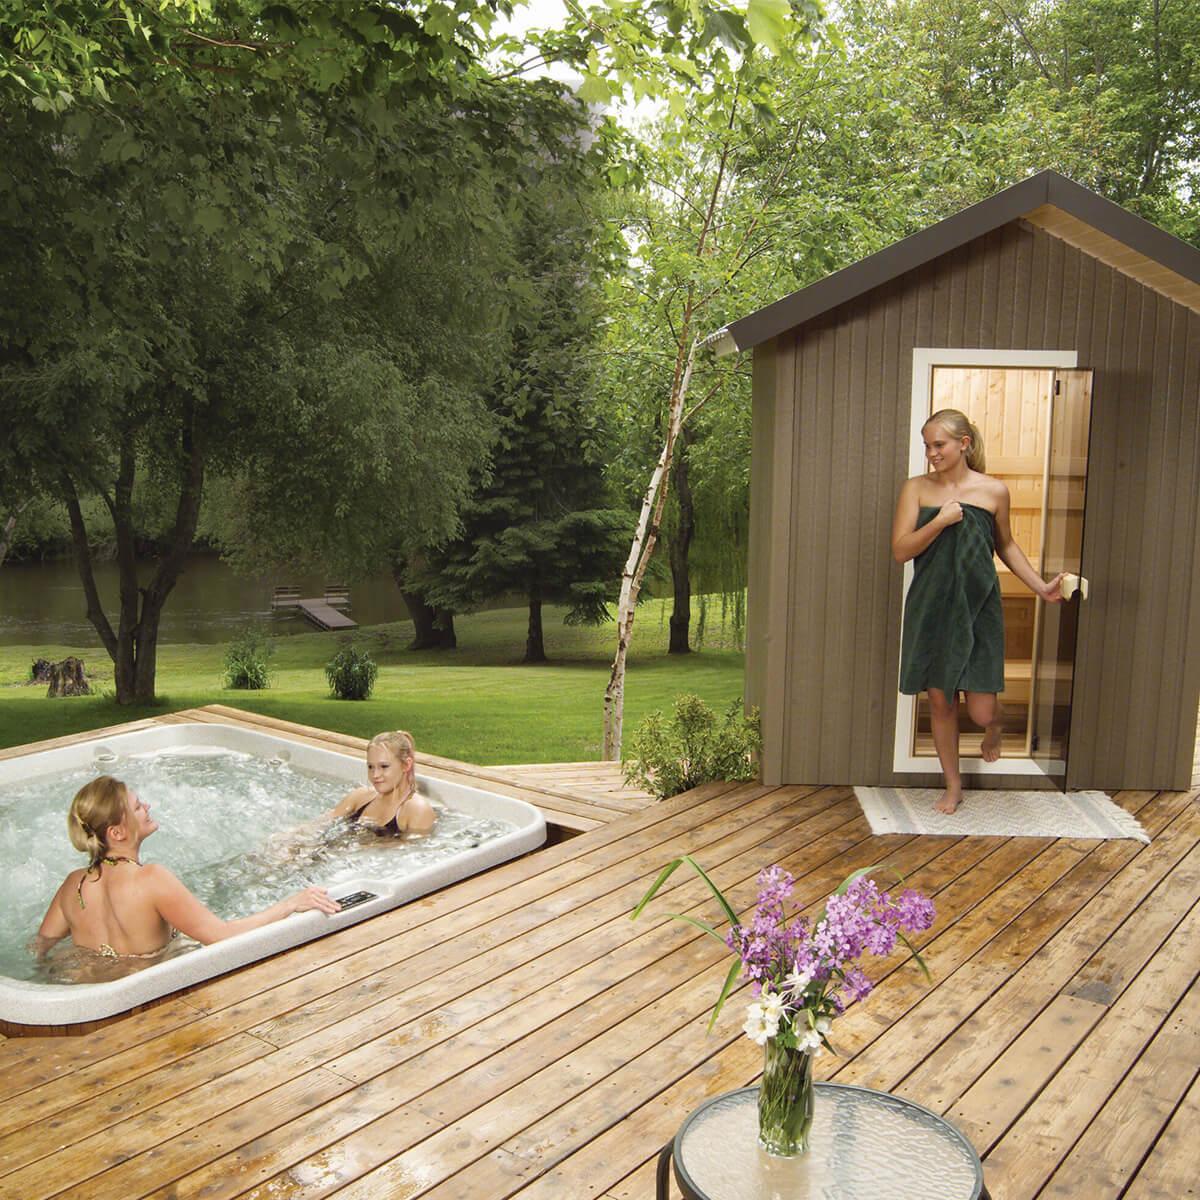 Finnleo Outdoor Saunas Family Image